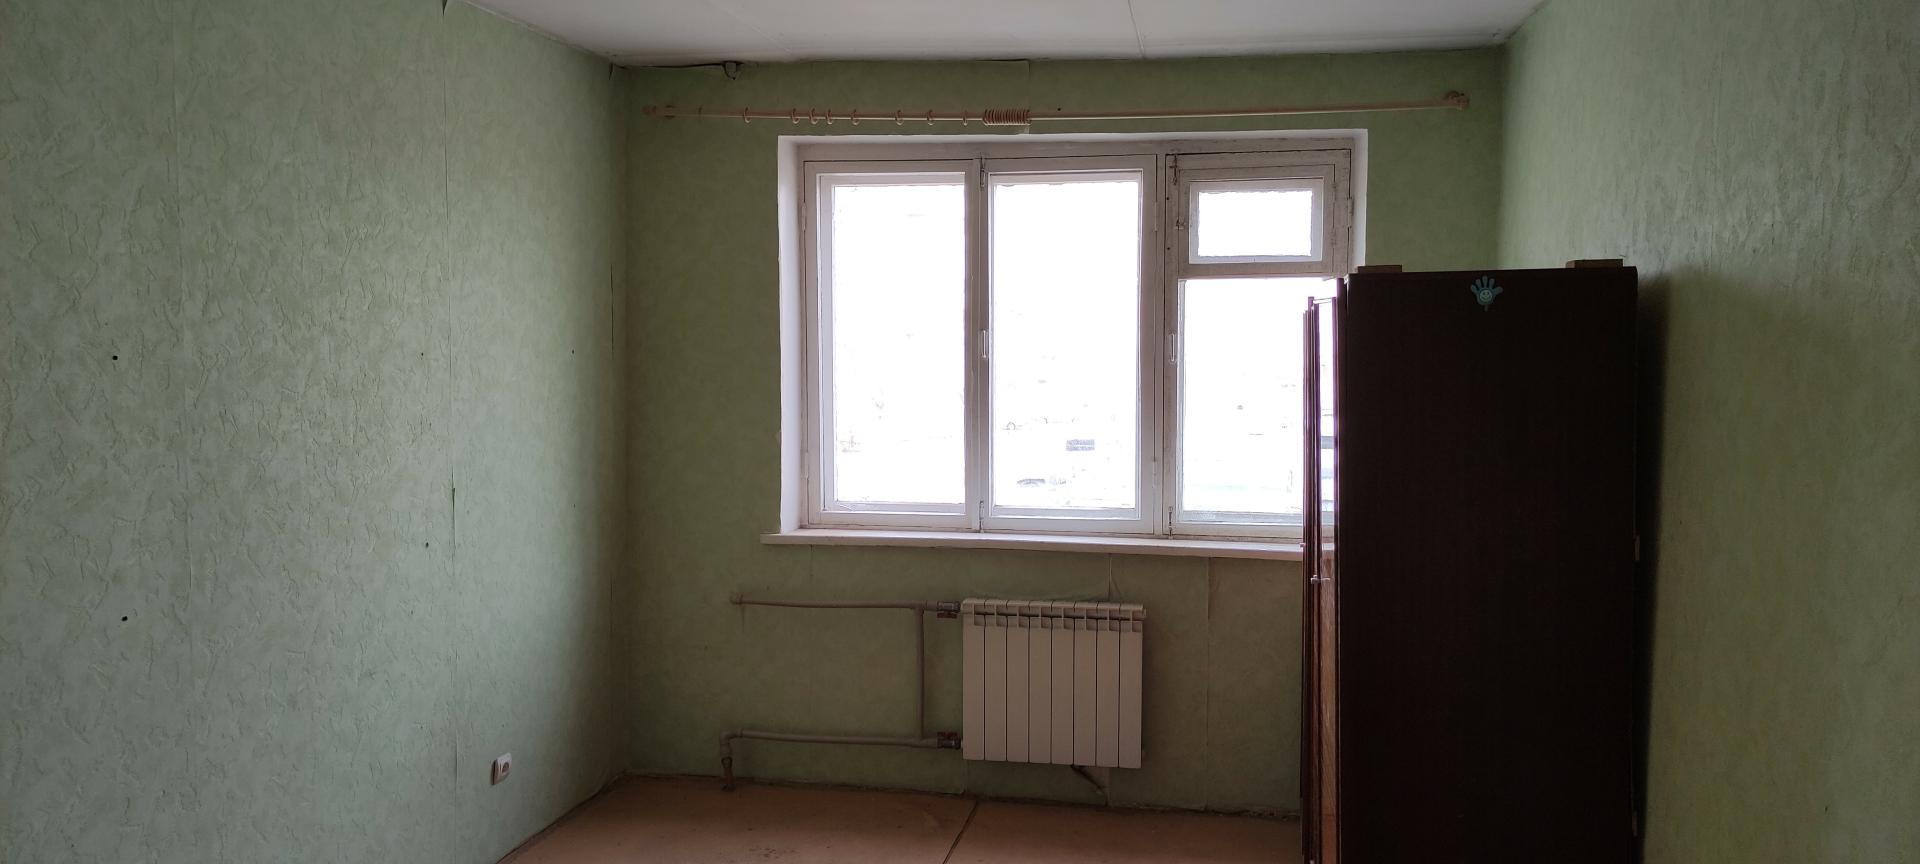 Продажа 3-комнатной квартиры, Волгоград, улица 2-я Штурманская,  дом 13